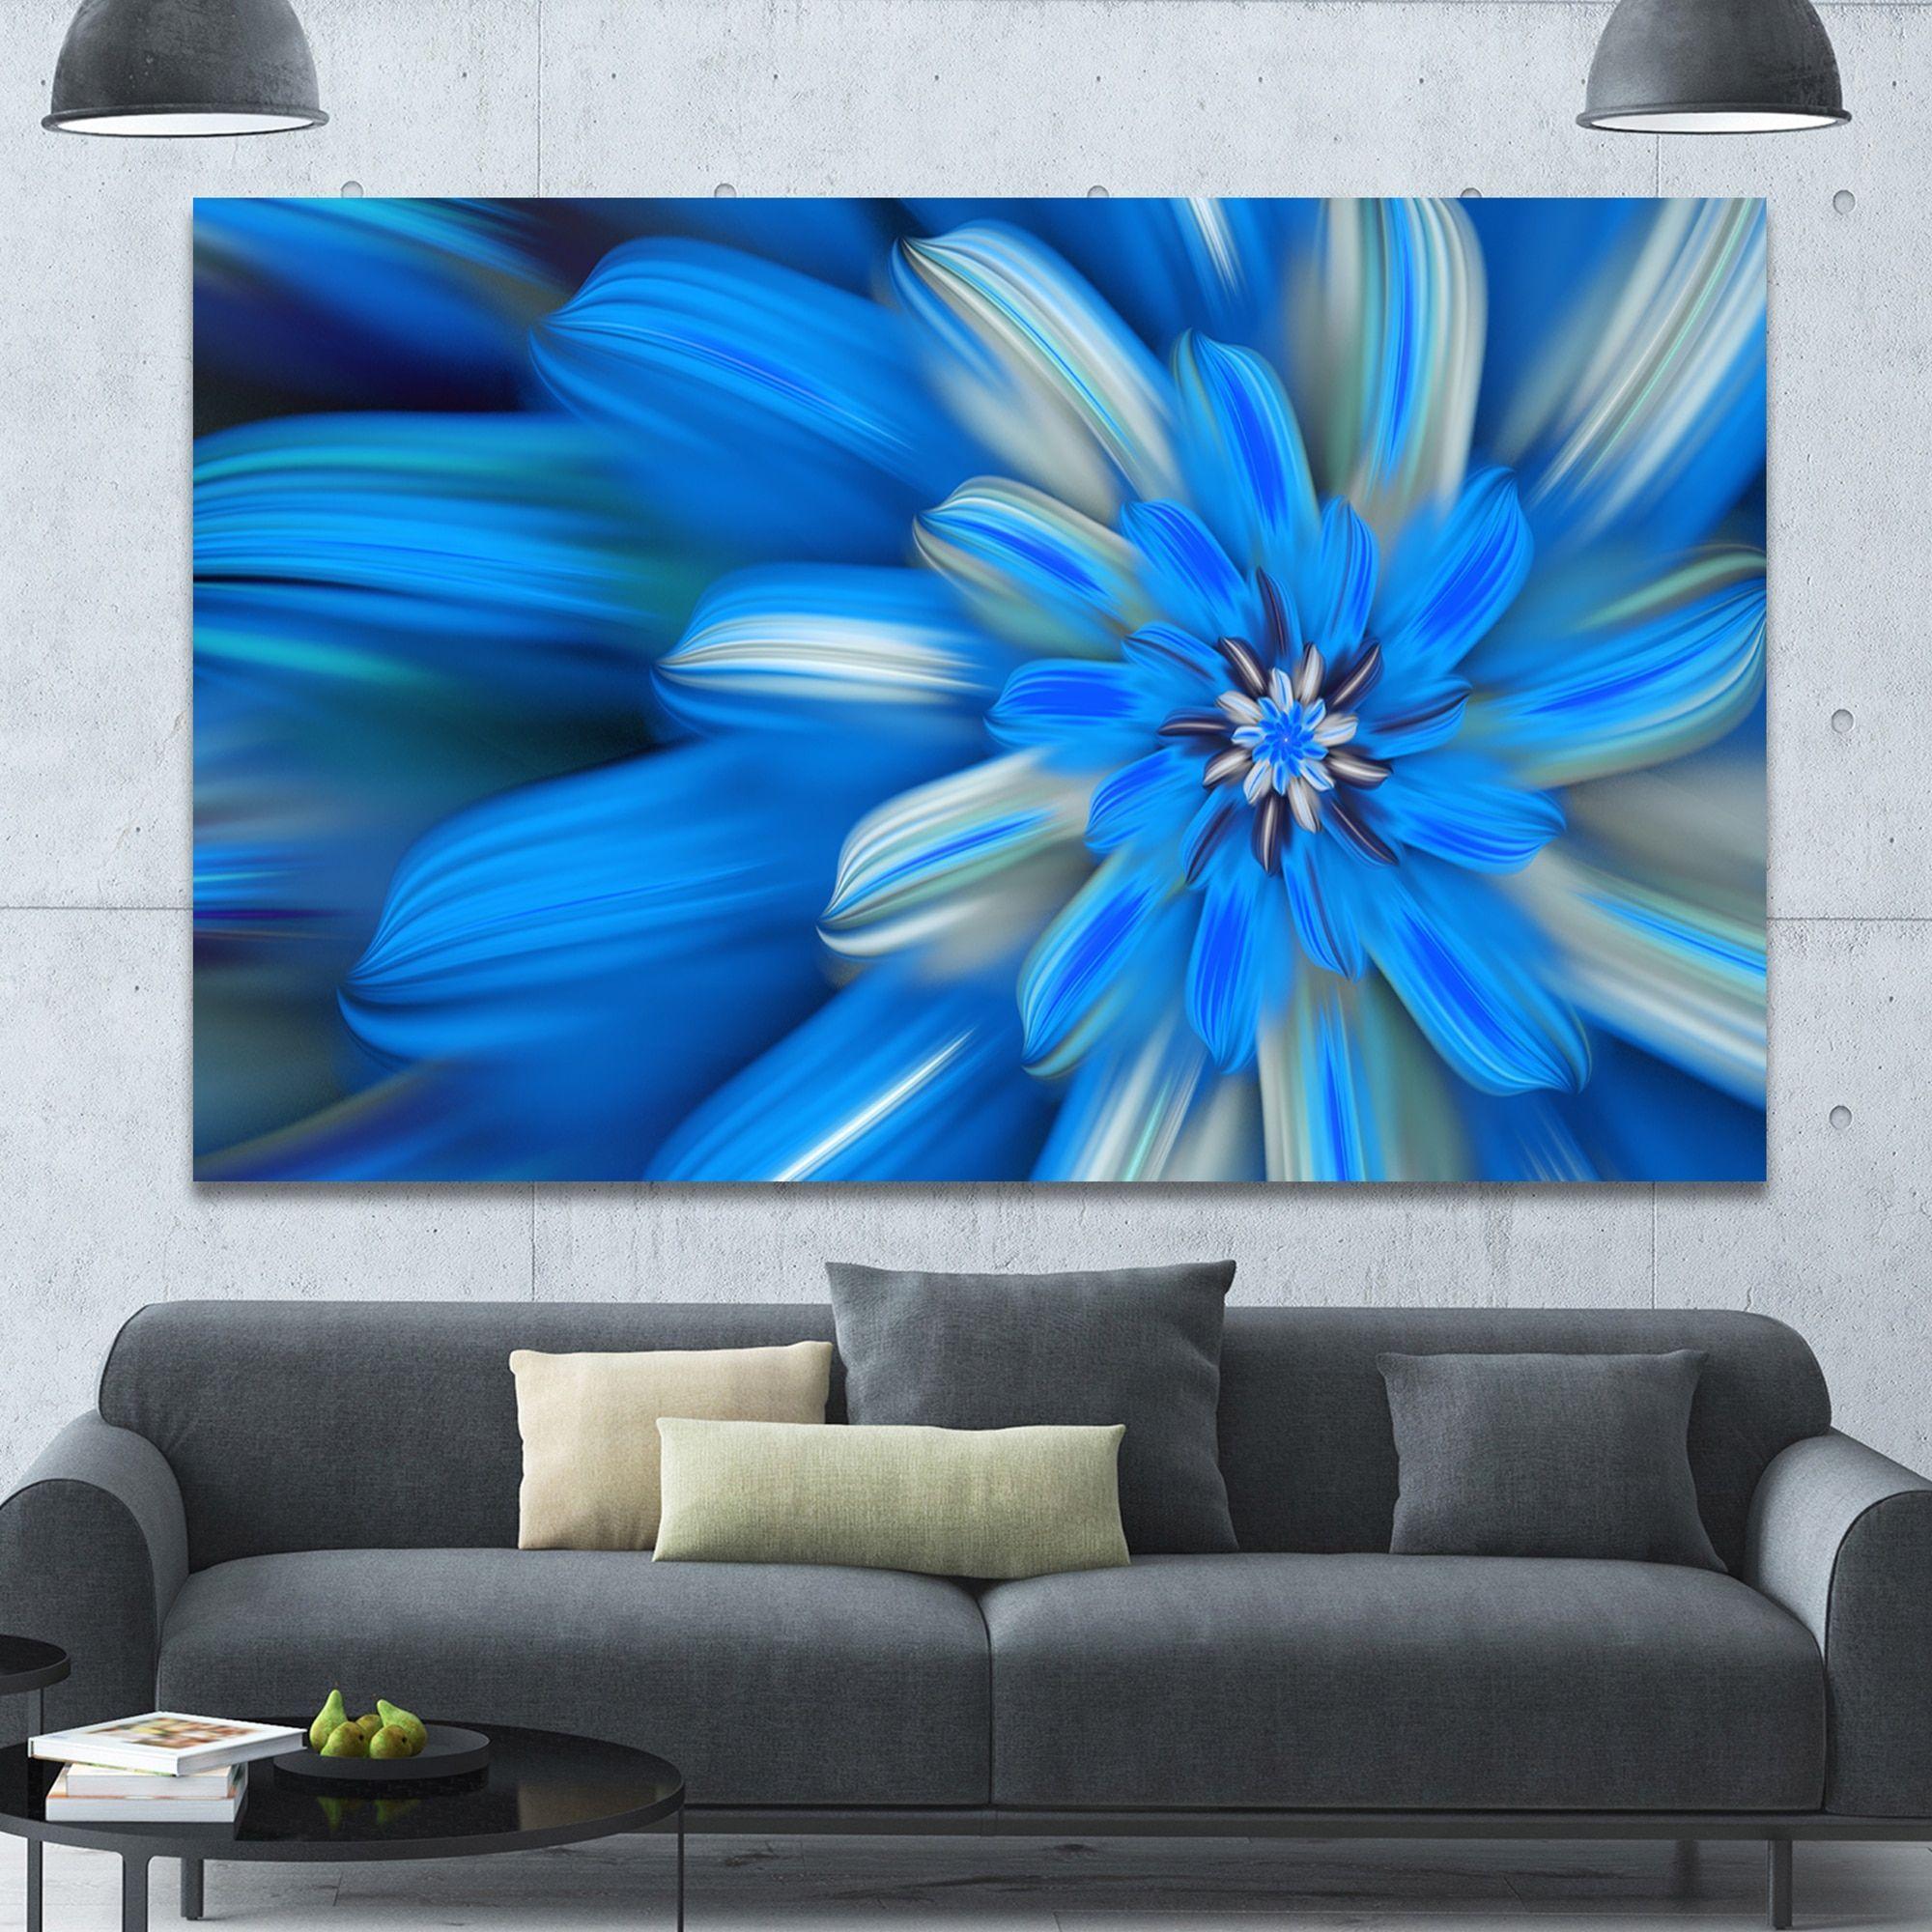 Designart uexotic dance of blue flower petalsu extra large floral